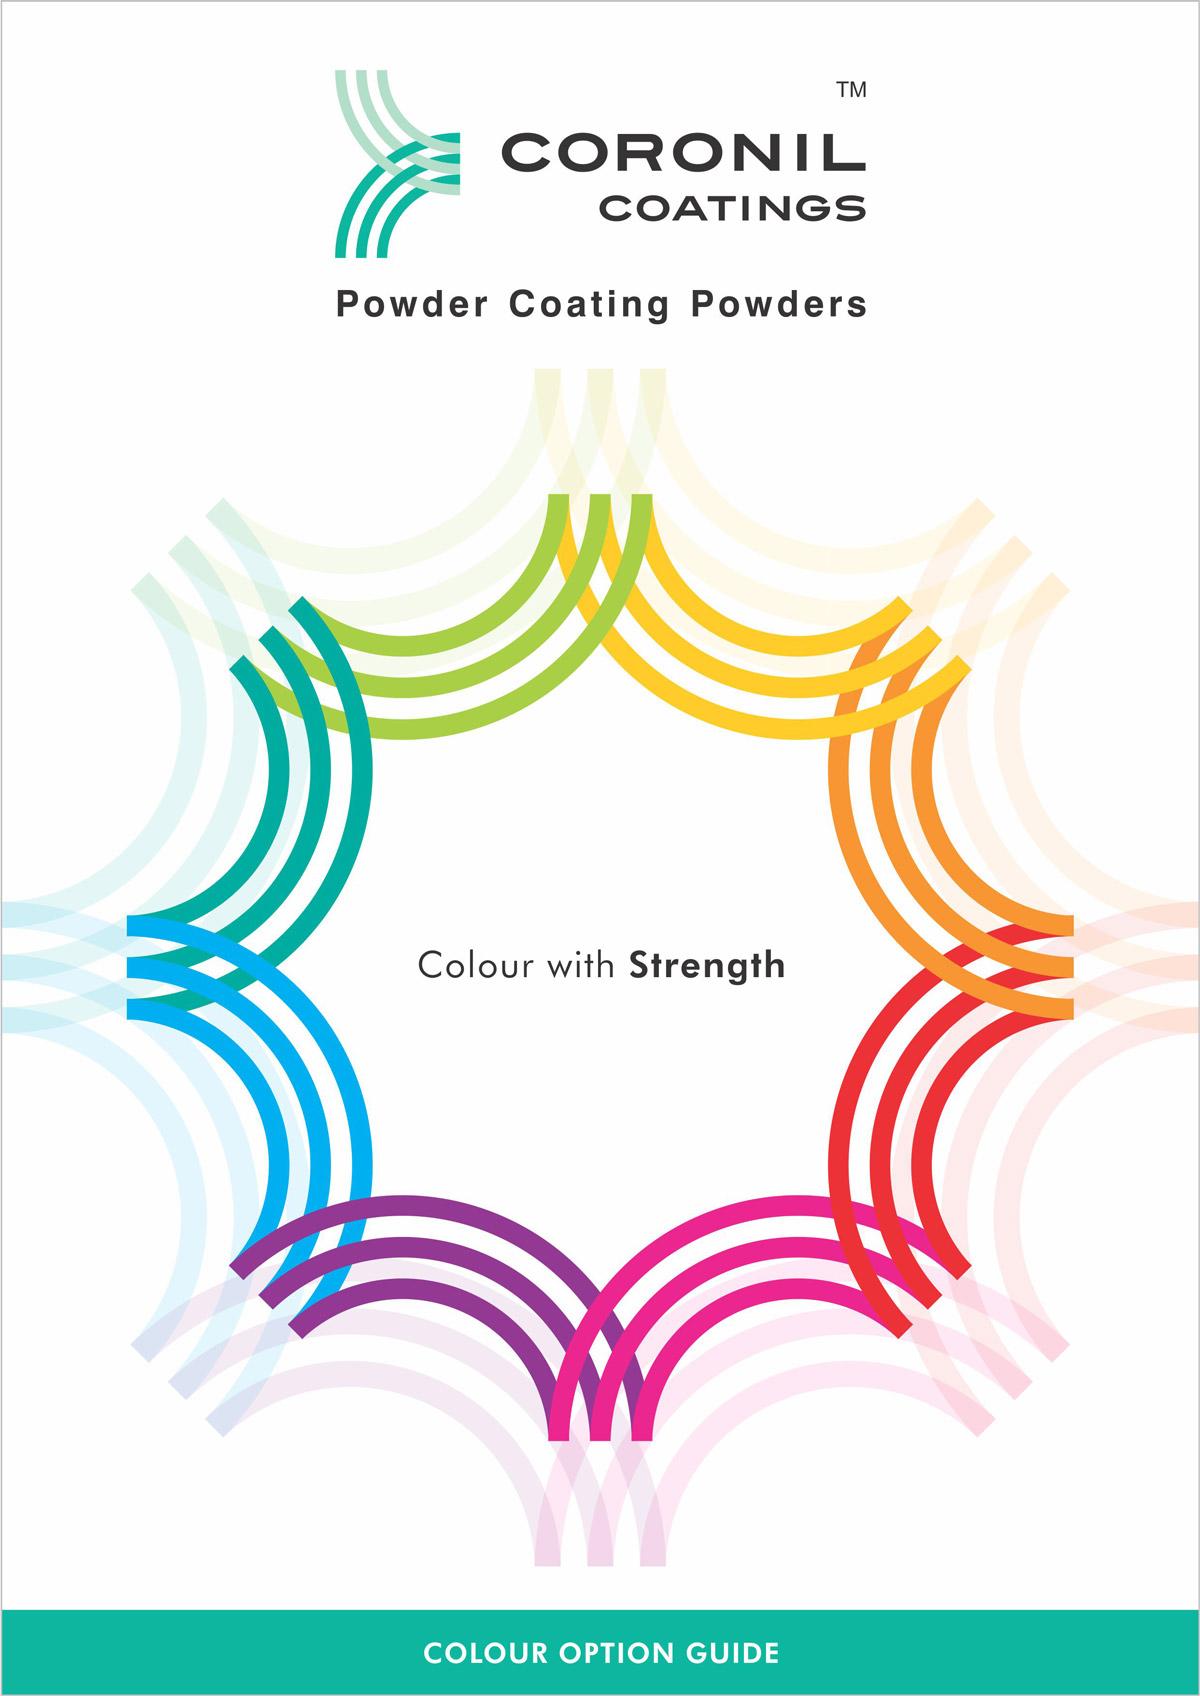 Shade card design for Powder Coating Powders